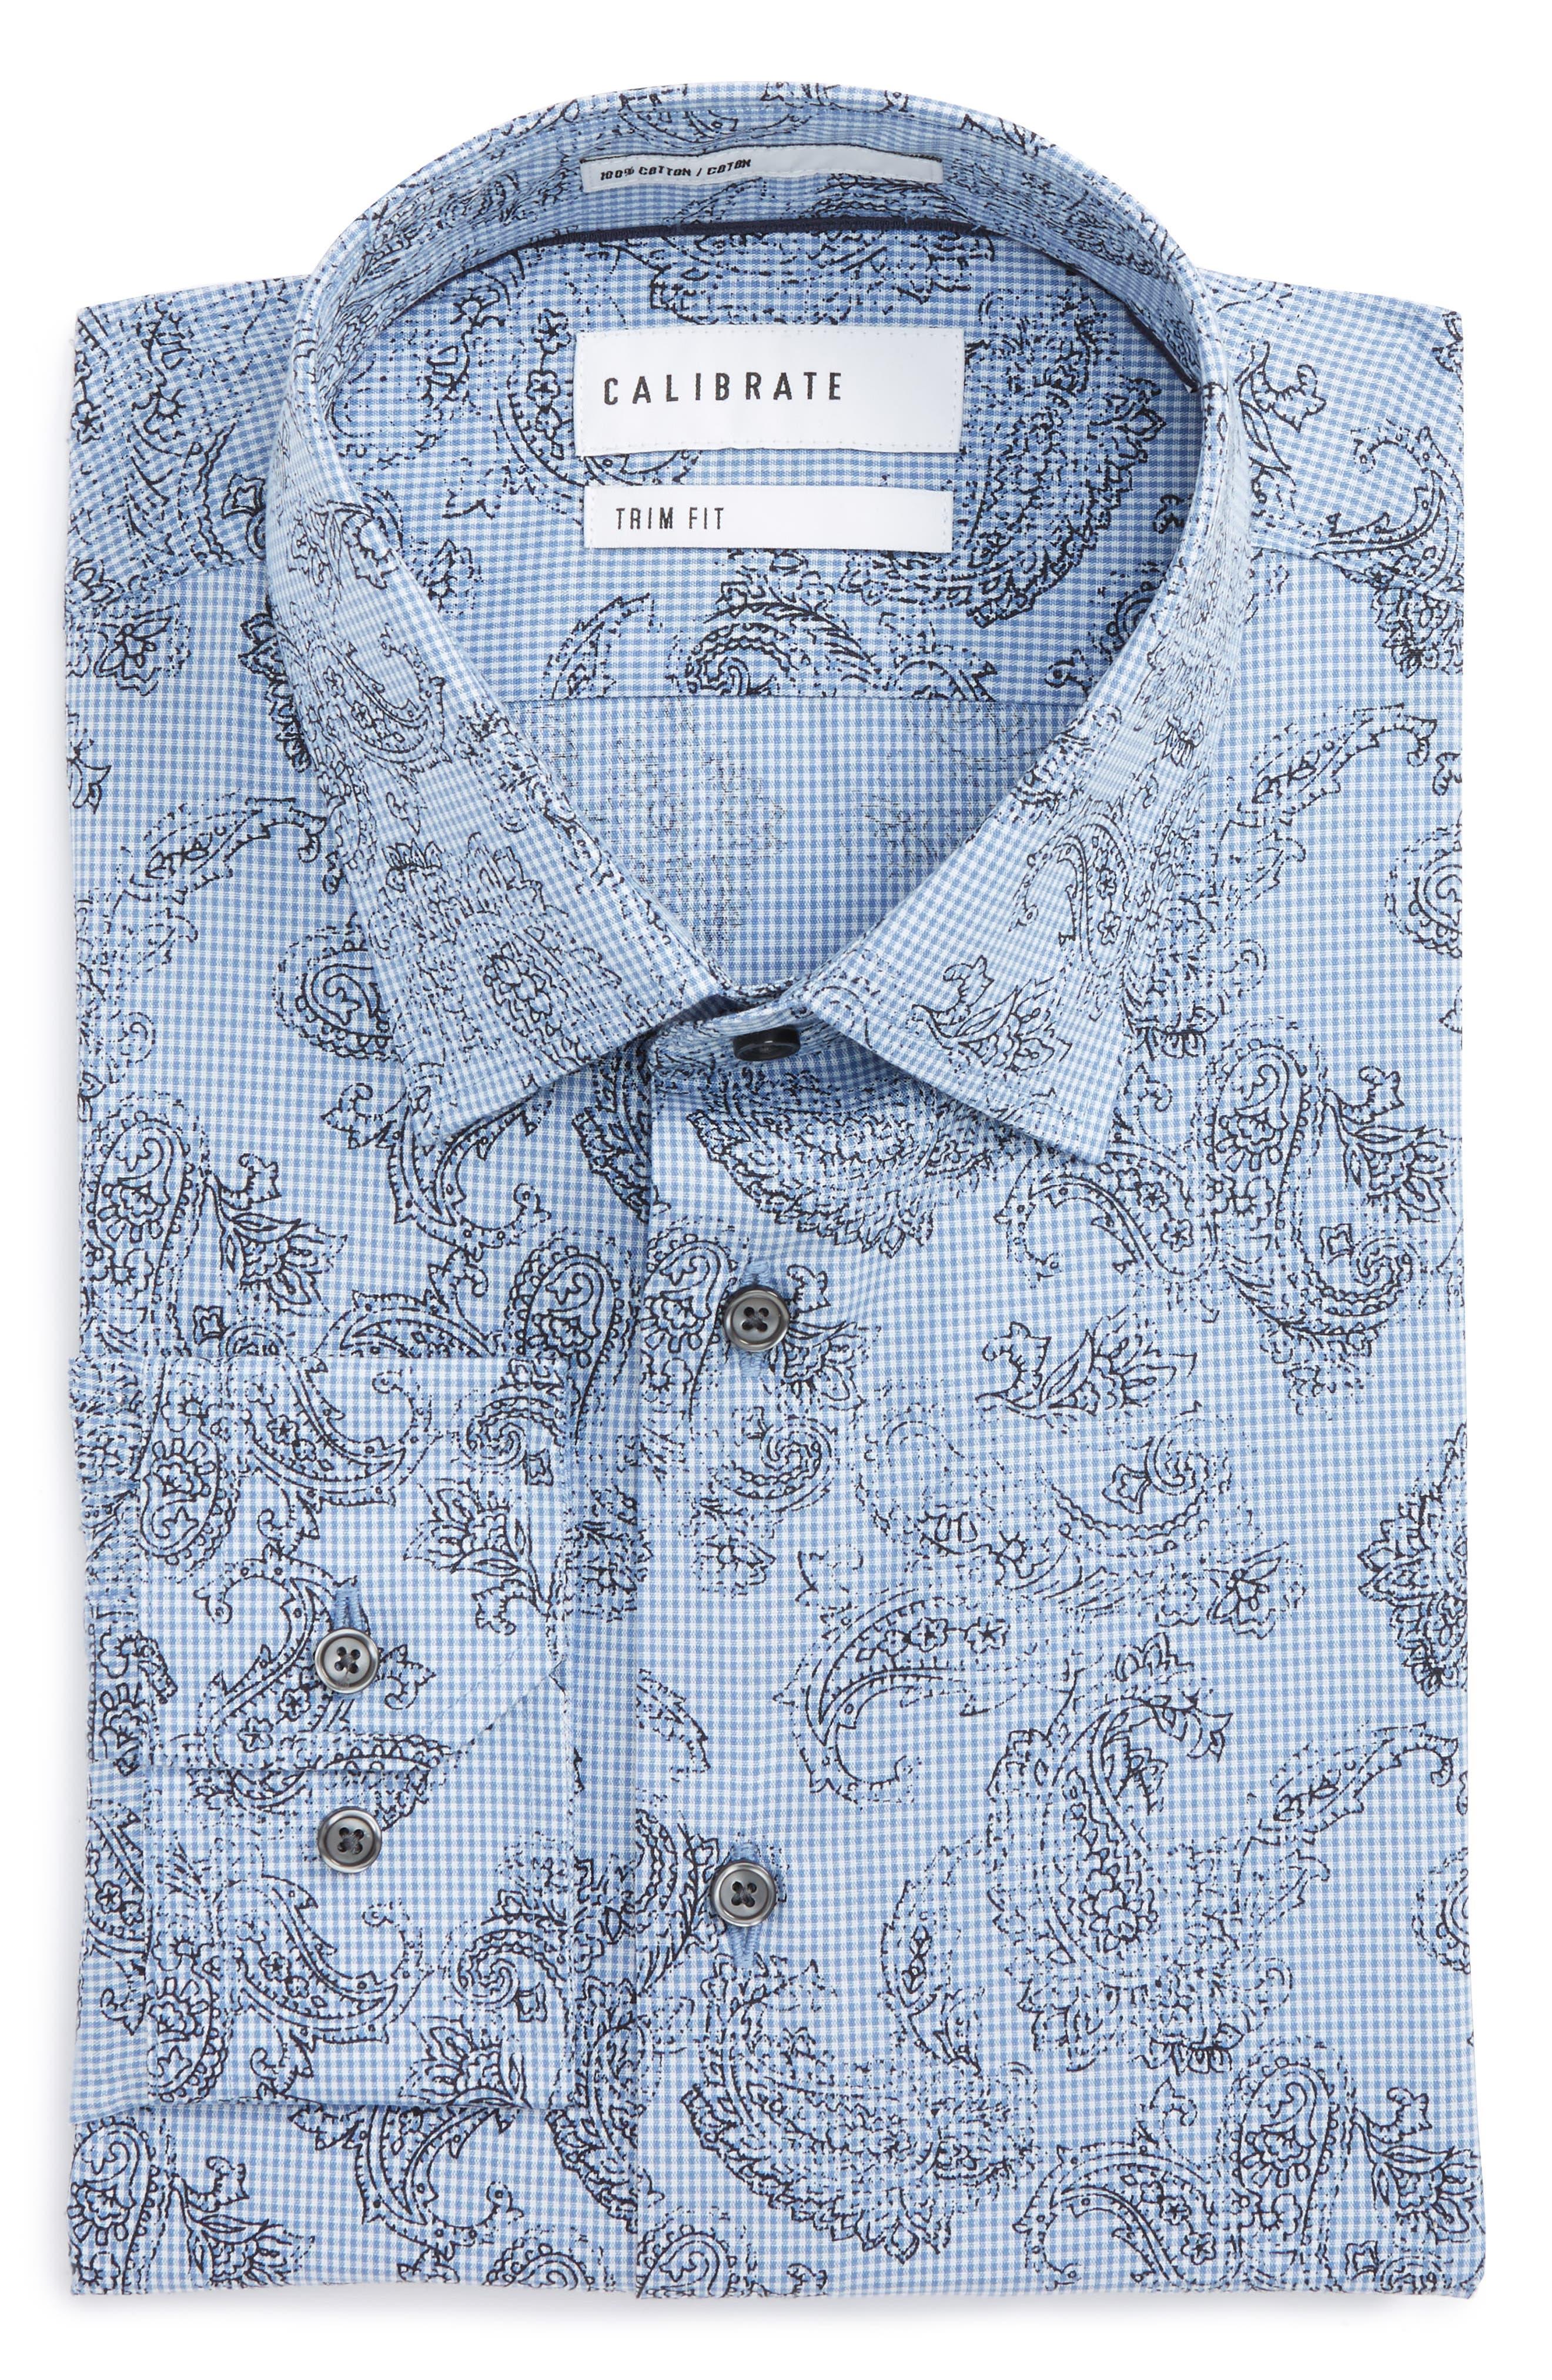 Main Image - Calibrate Trim Fit Paisley Plaid Dress Shirt